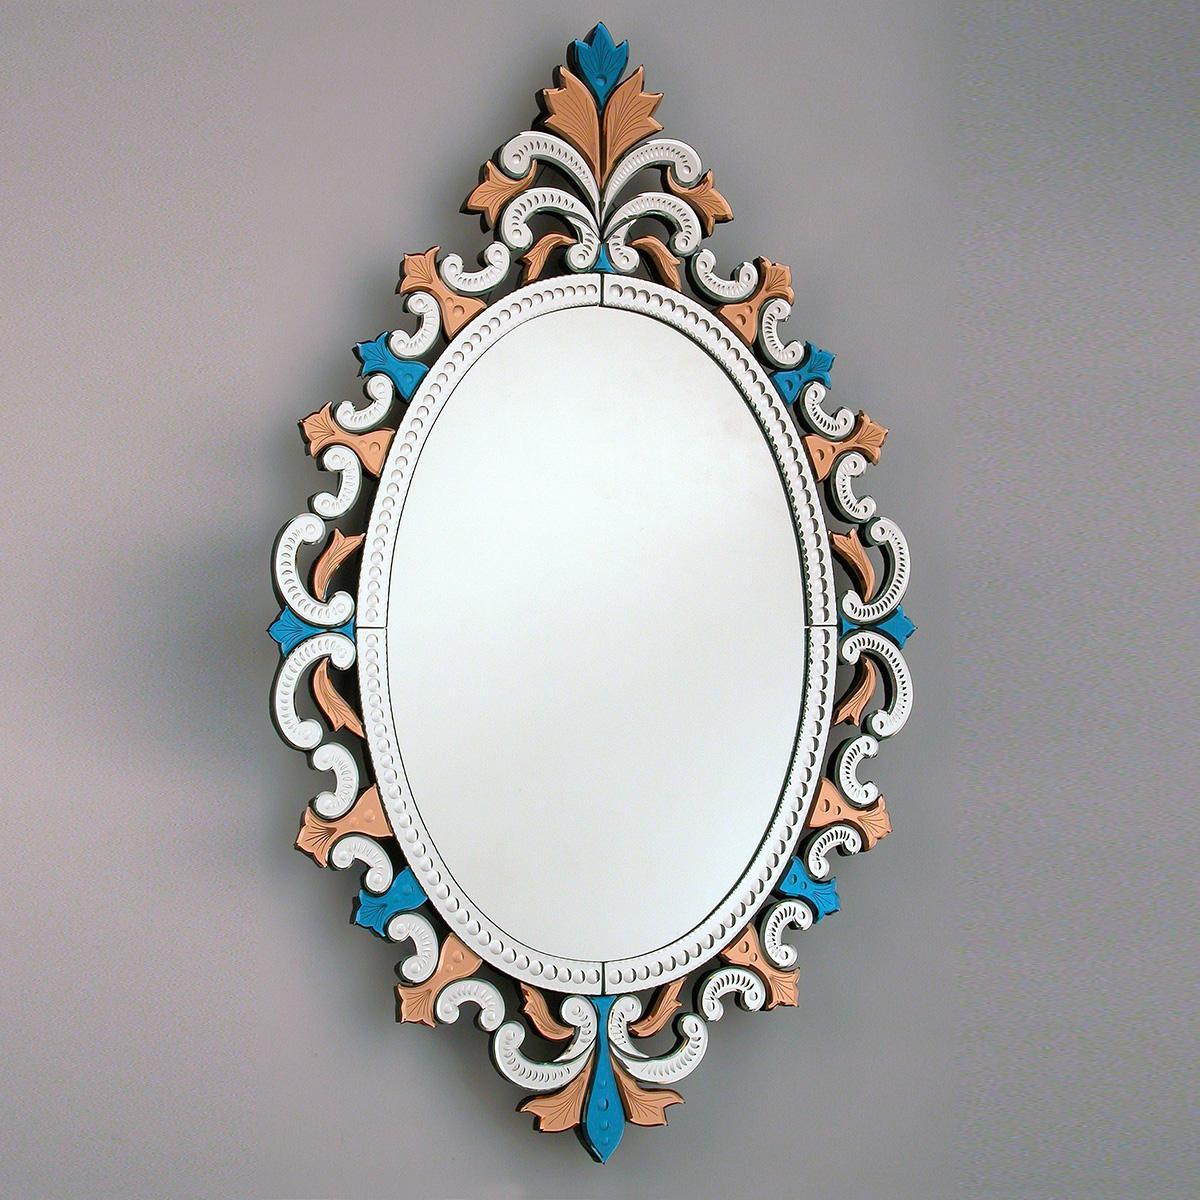 """Sprezzante"" Murano glas venezianischen spiegel"